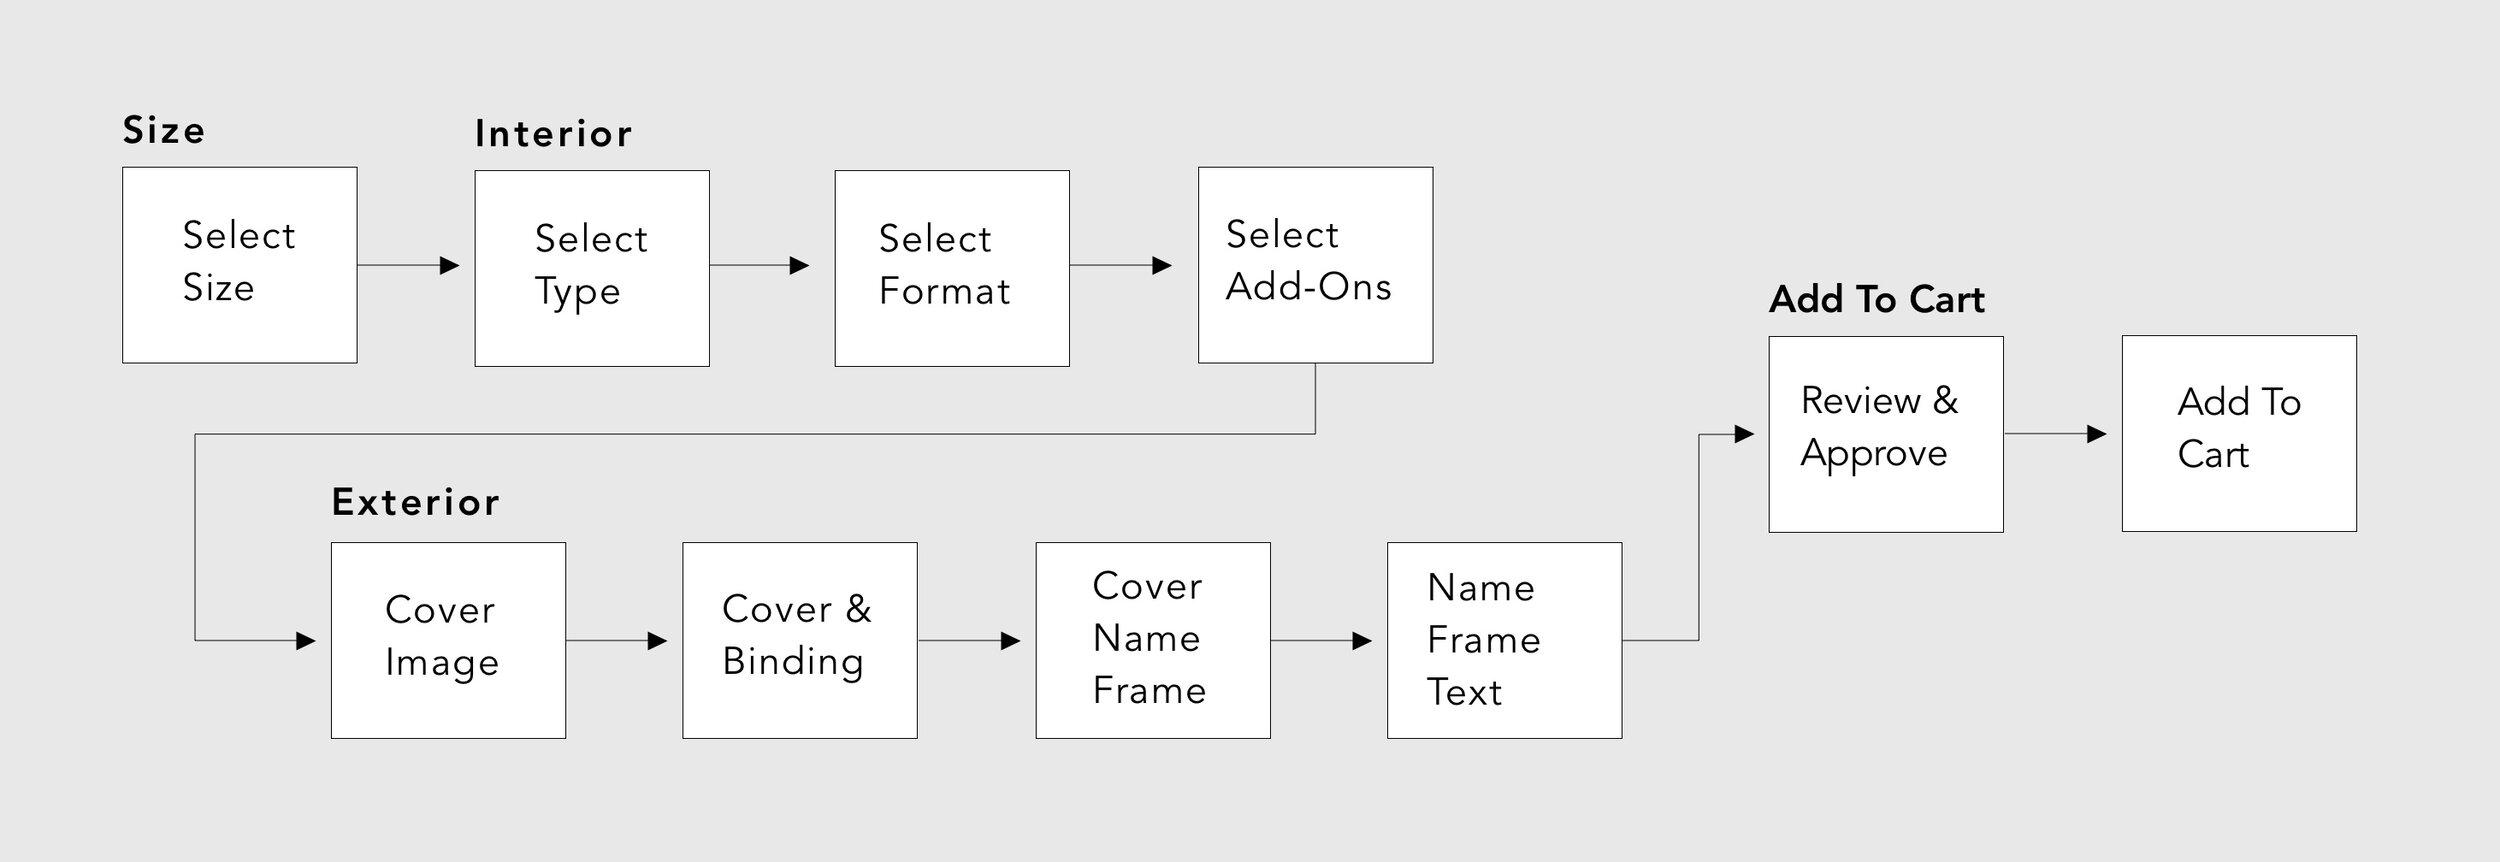 Personalized Task Analysis Copy_ltG_1x.jpg